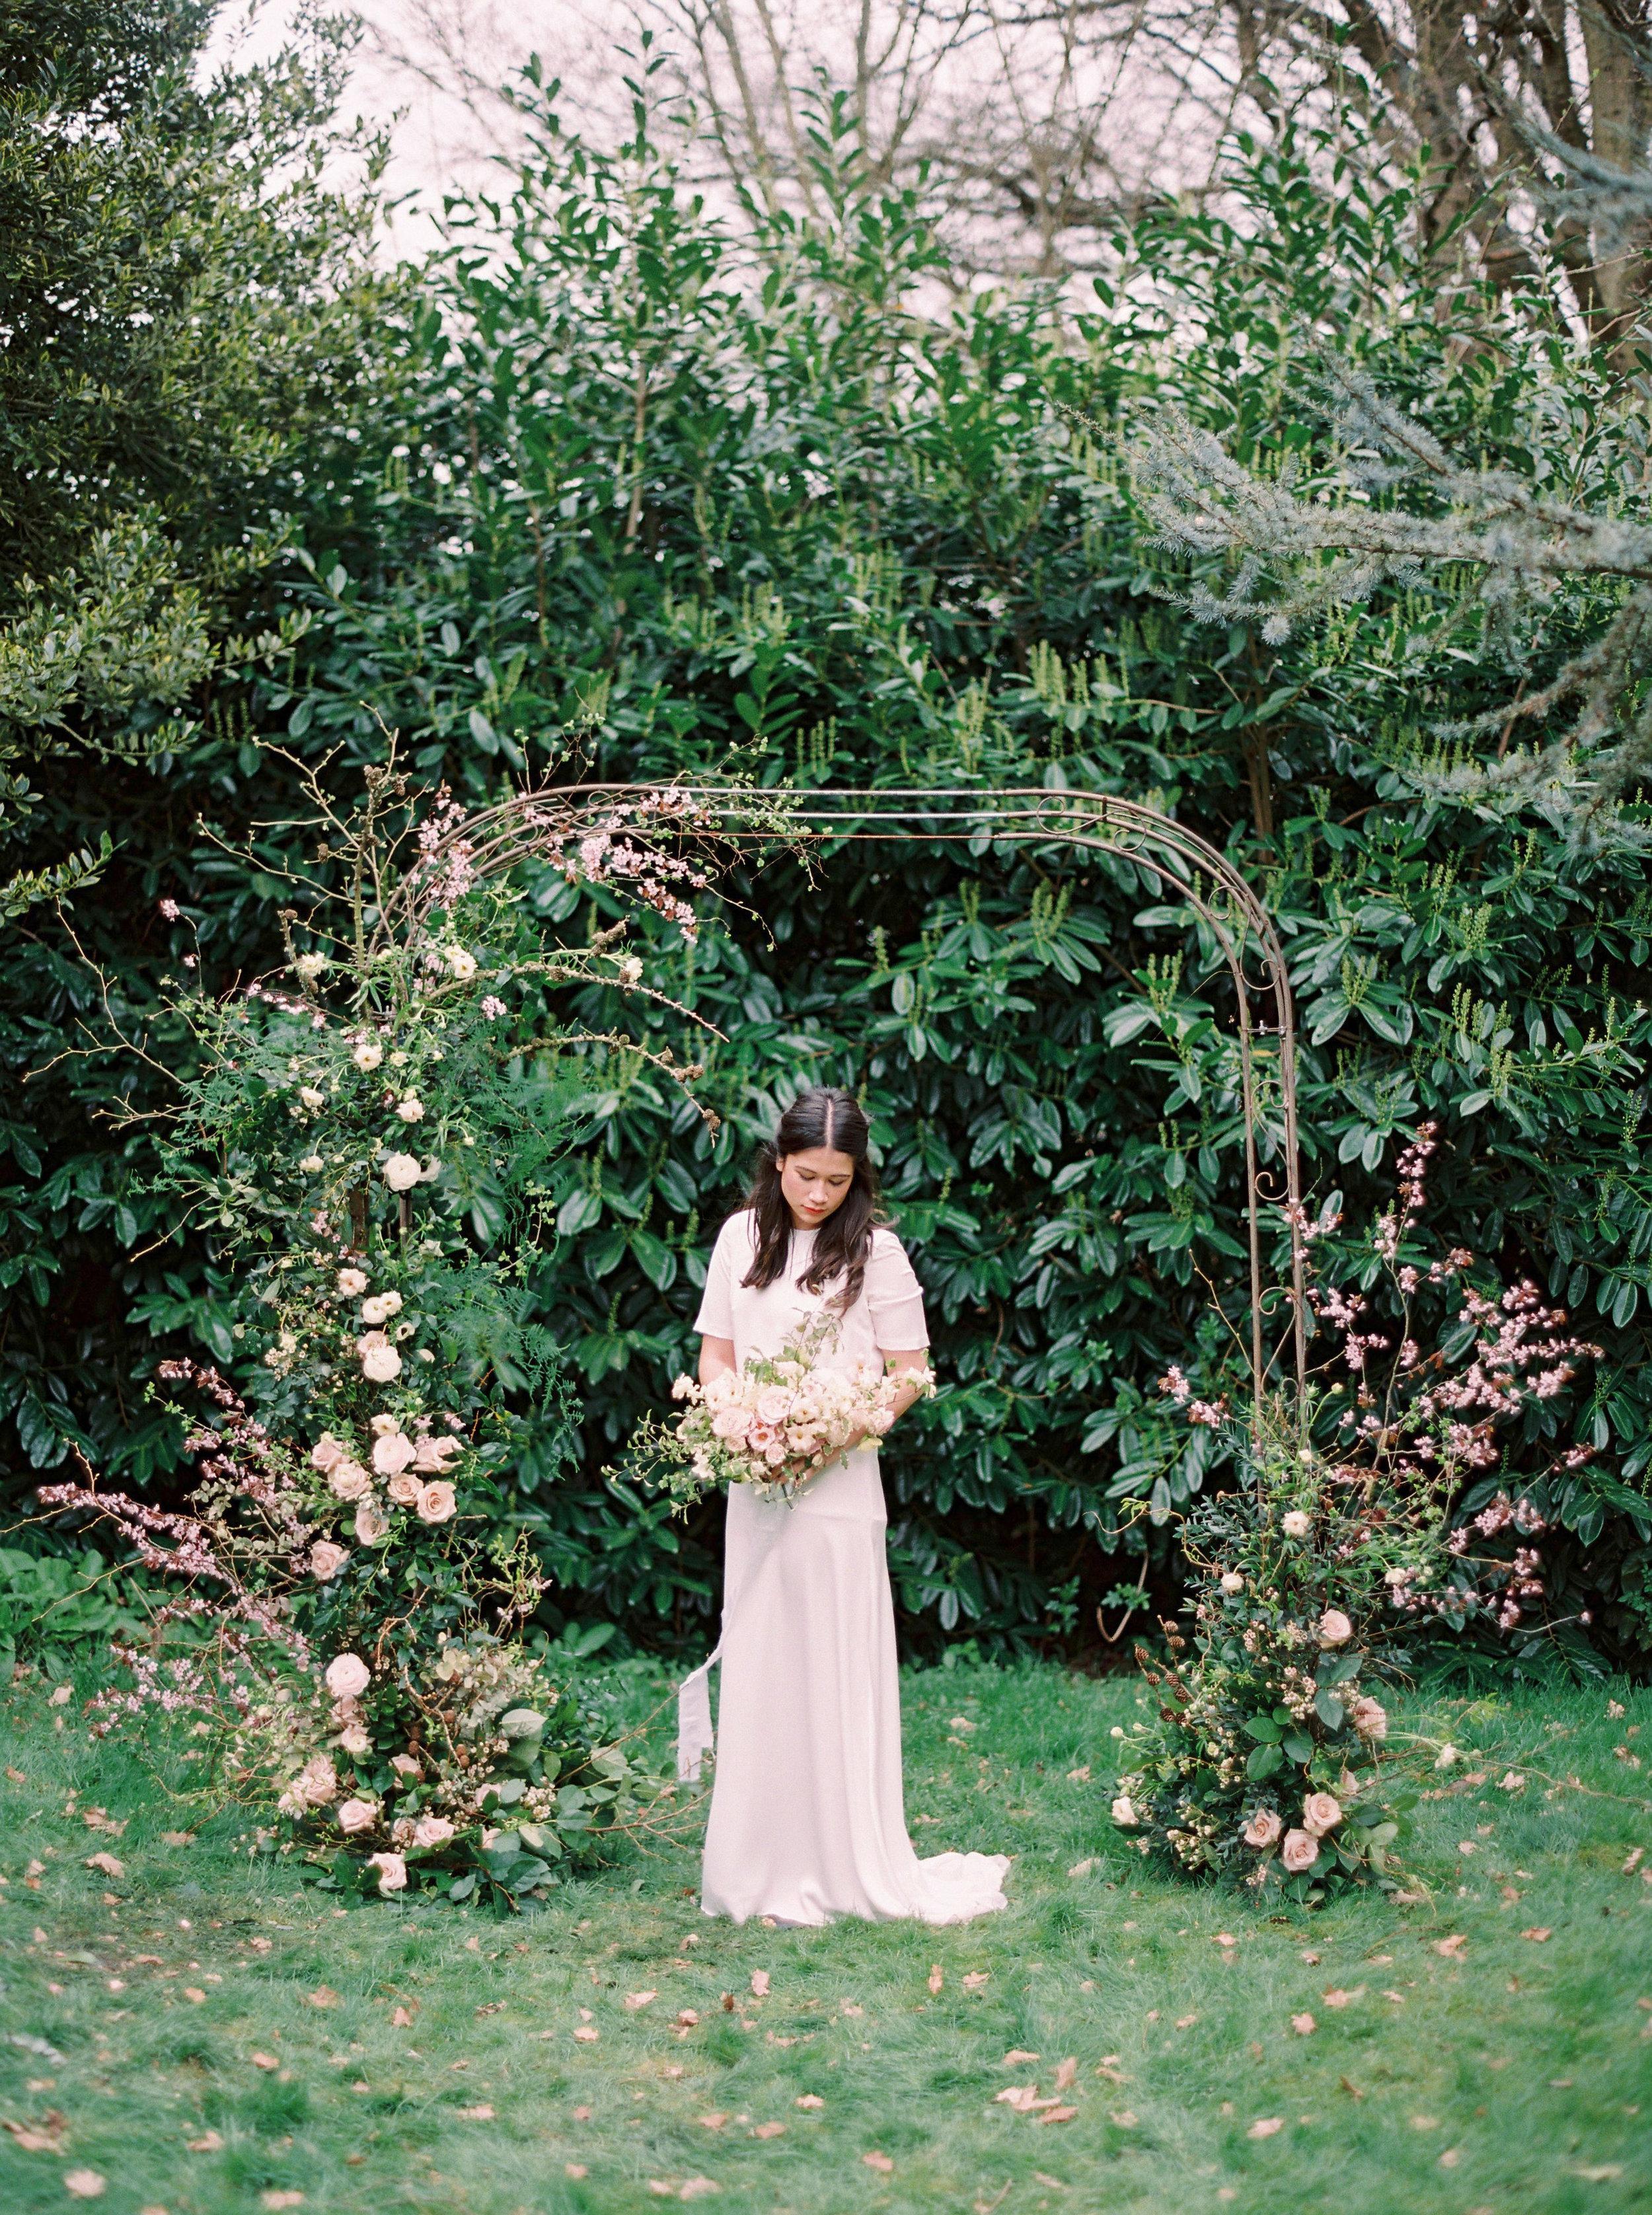 Kent wedding flowers luxury course Jennifer Pinder